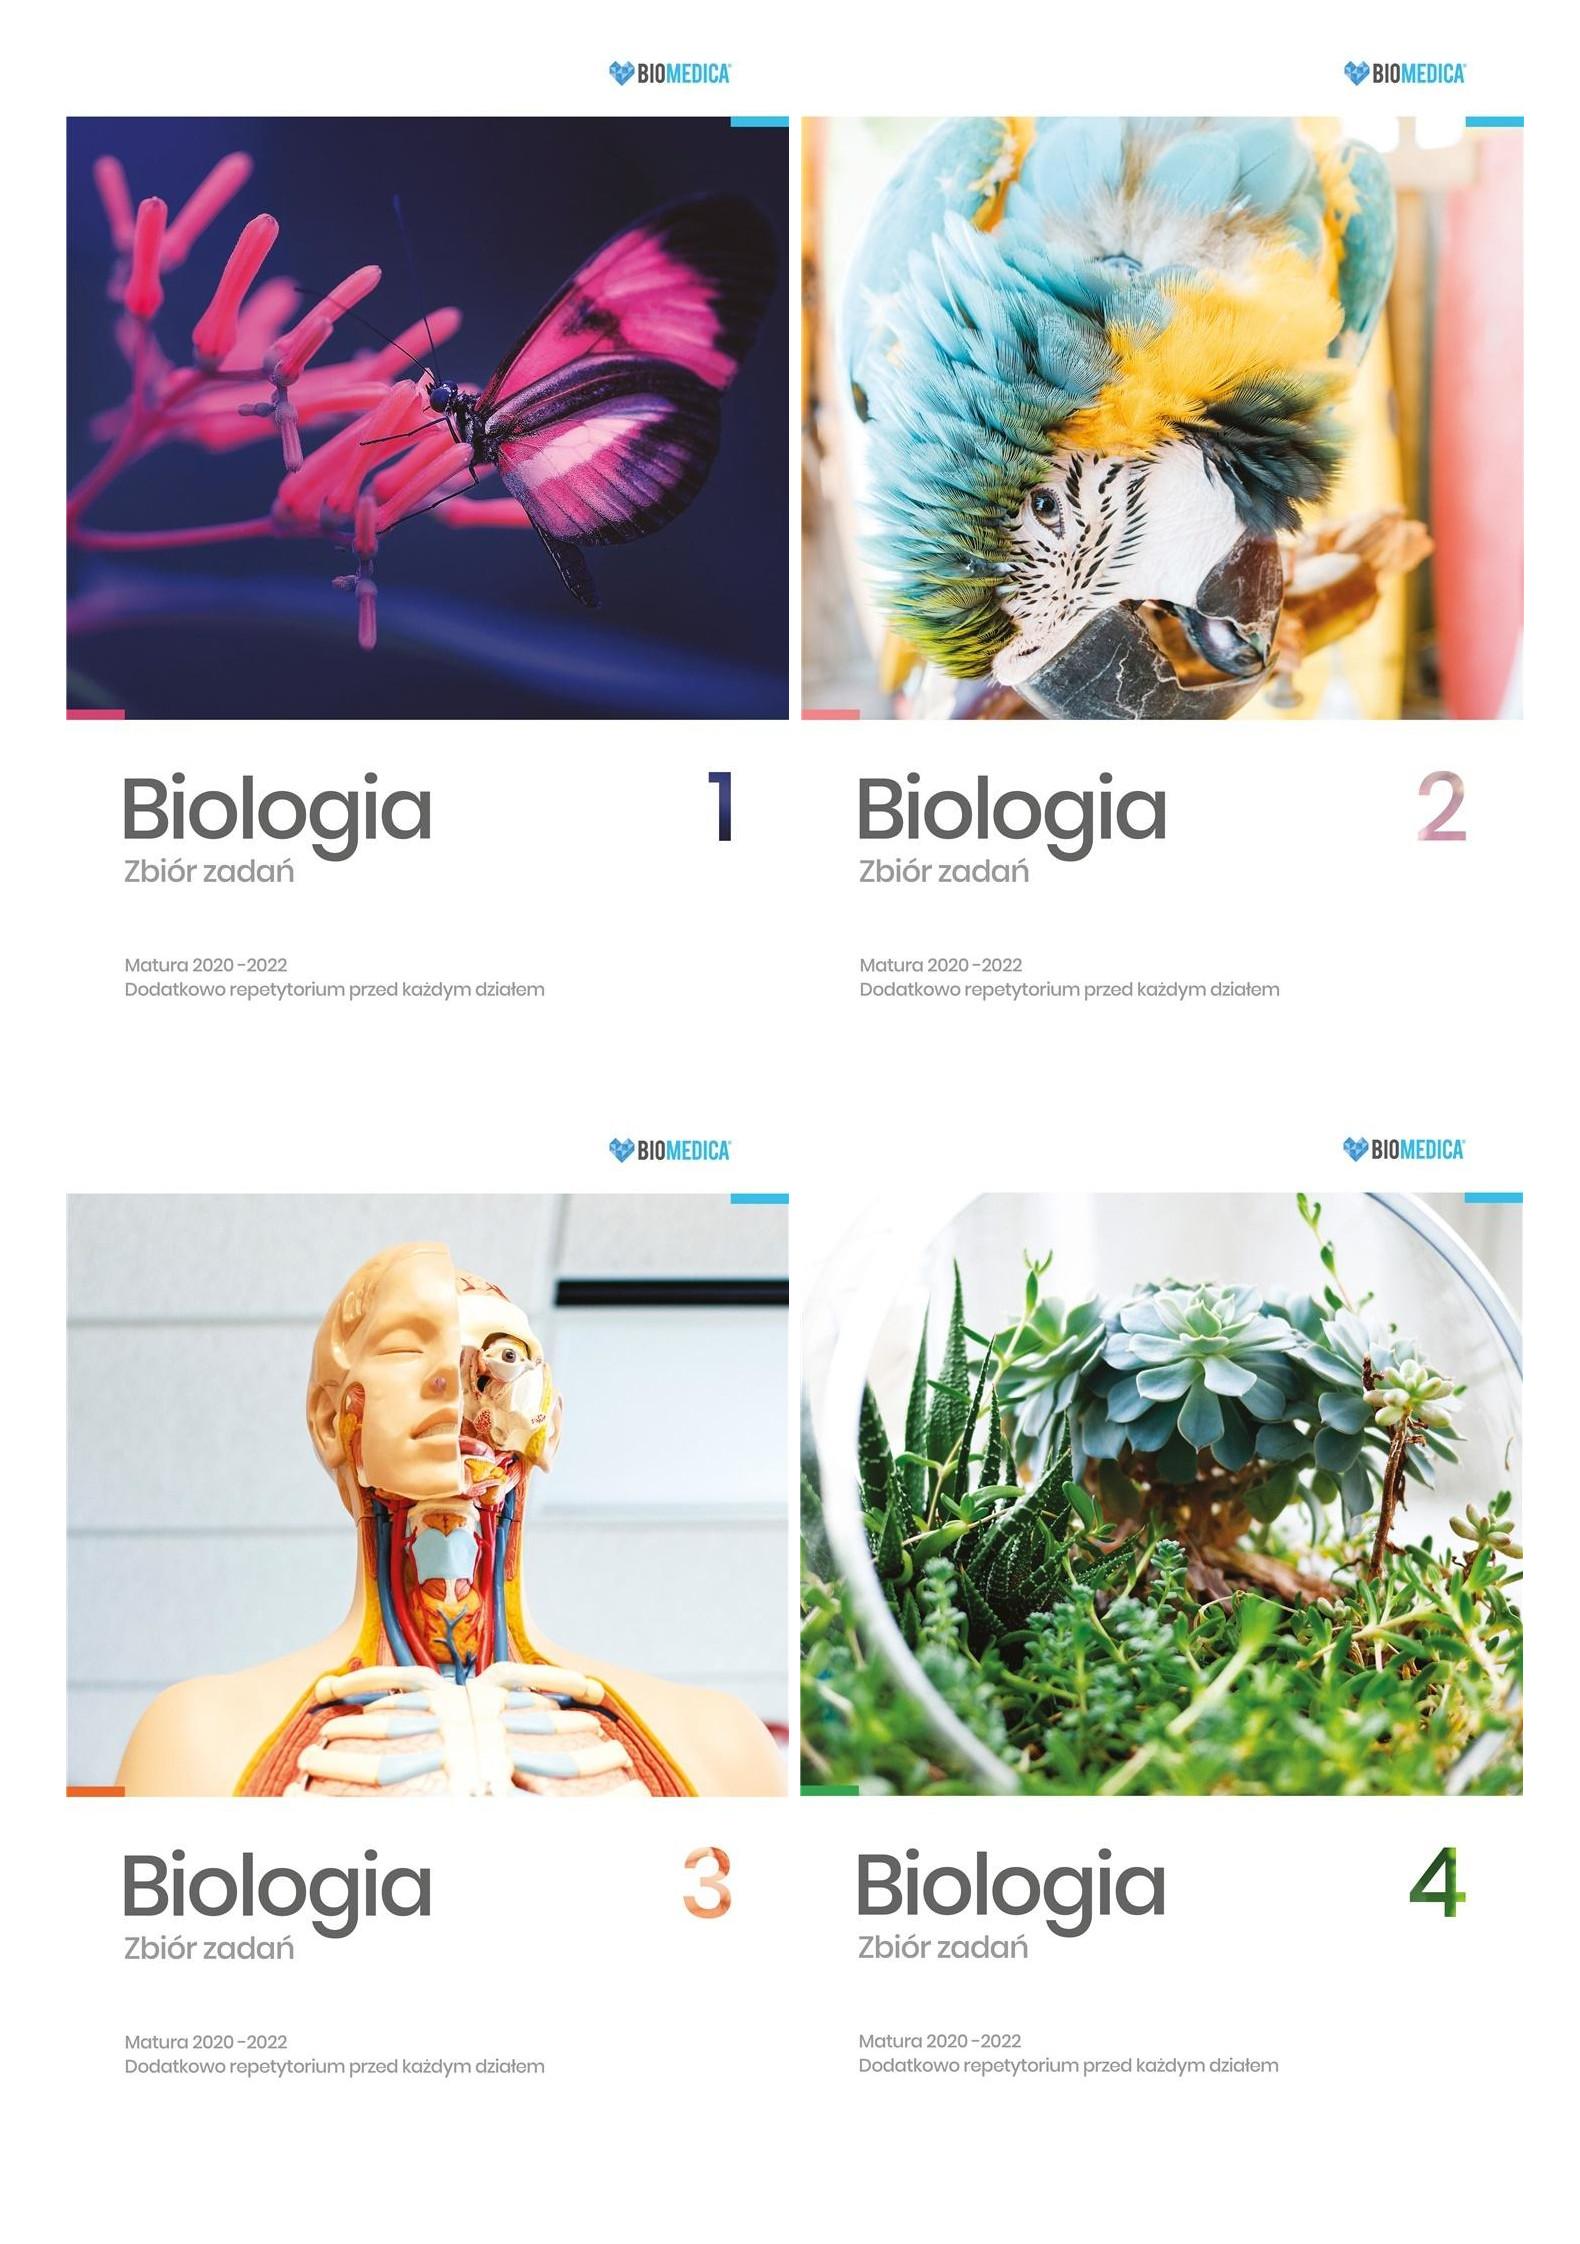 Pakiet: Biologia. Zbiór zadań. Matura 2020-2022. Tom 1 - 4